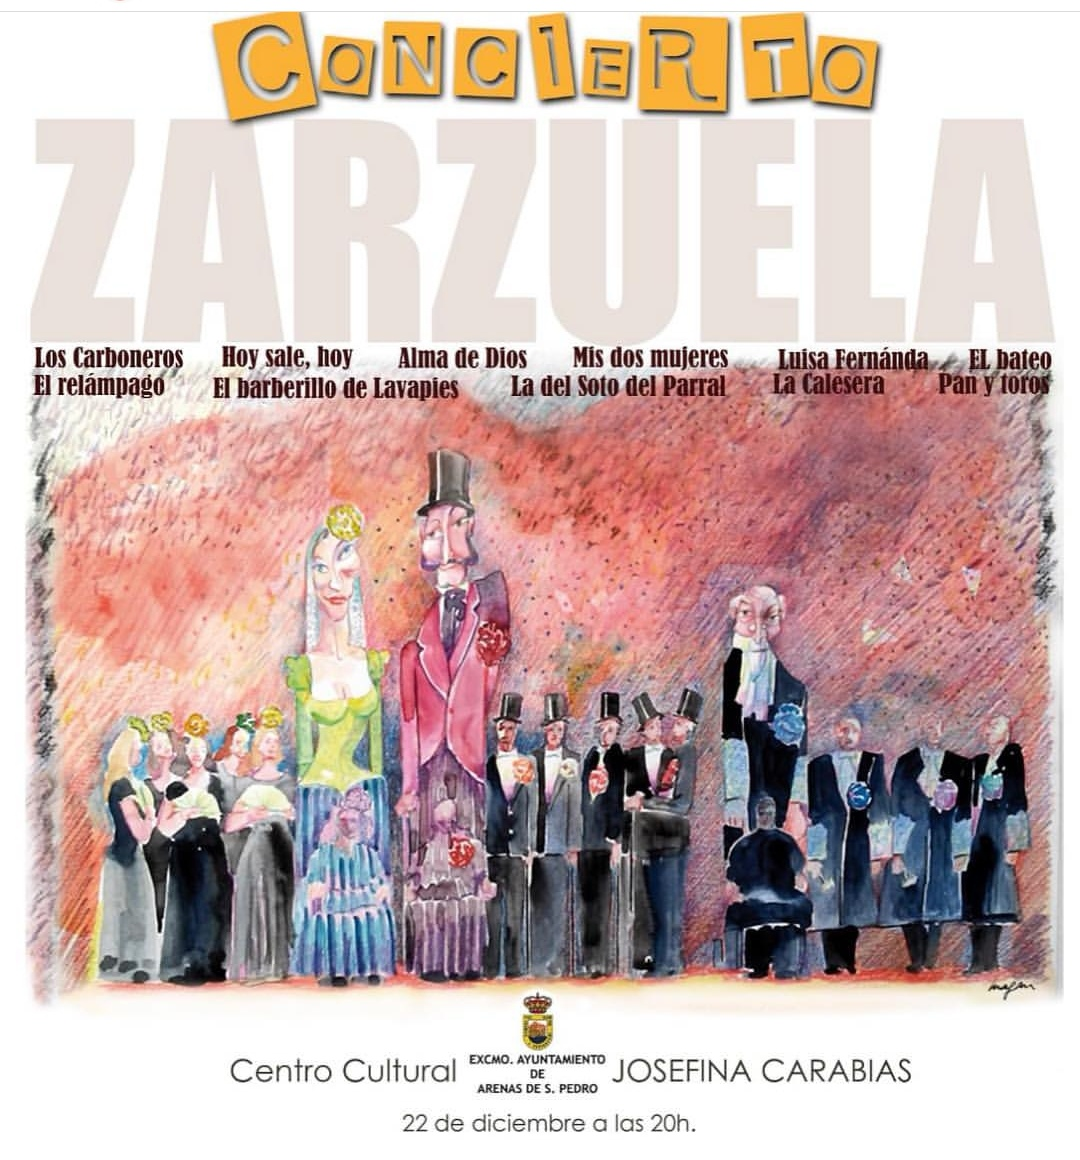 Zarzuela Arenas de San Pedro - TiétarTeVe